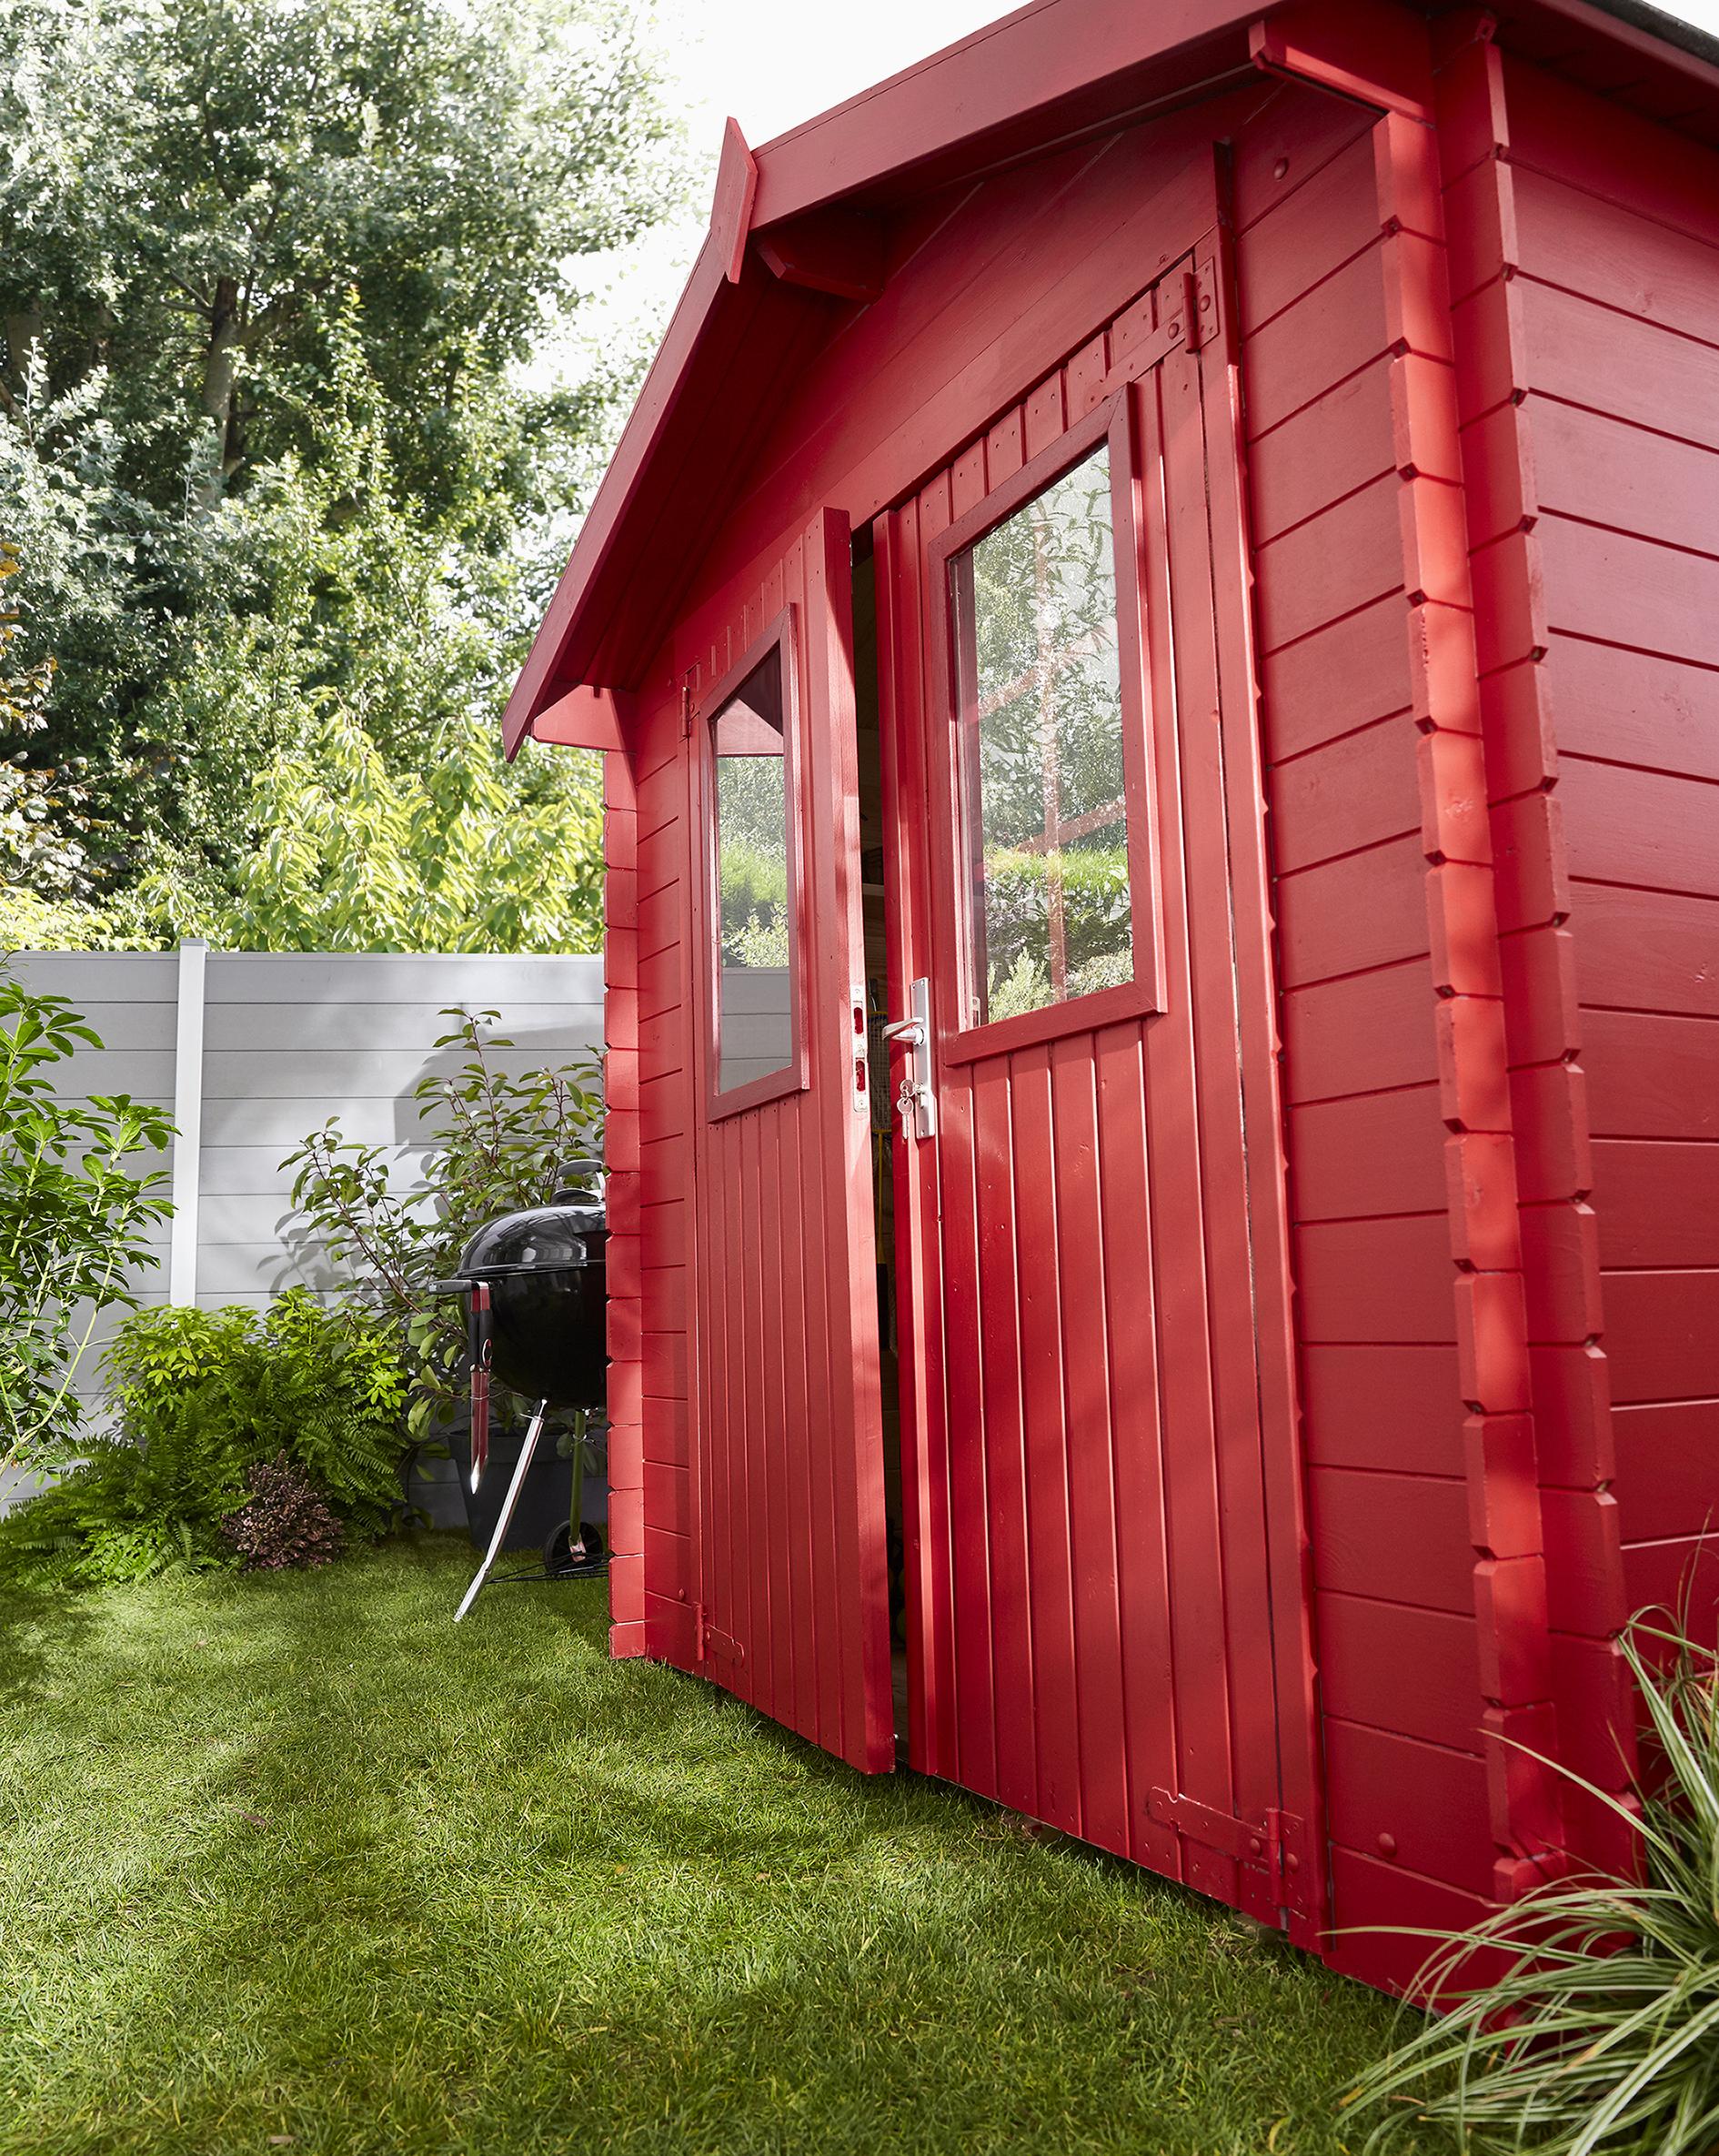 Abri De Jardin Permis De Construire Génial Abri De Jardin Boite A Outils Idées Abris Castorama Dossier